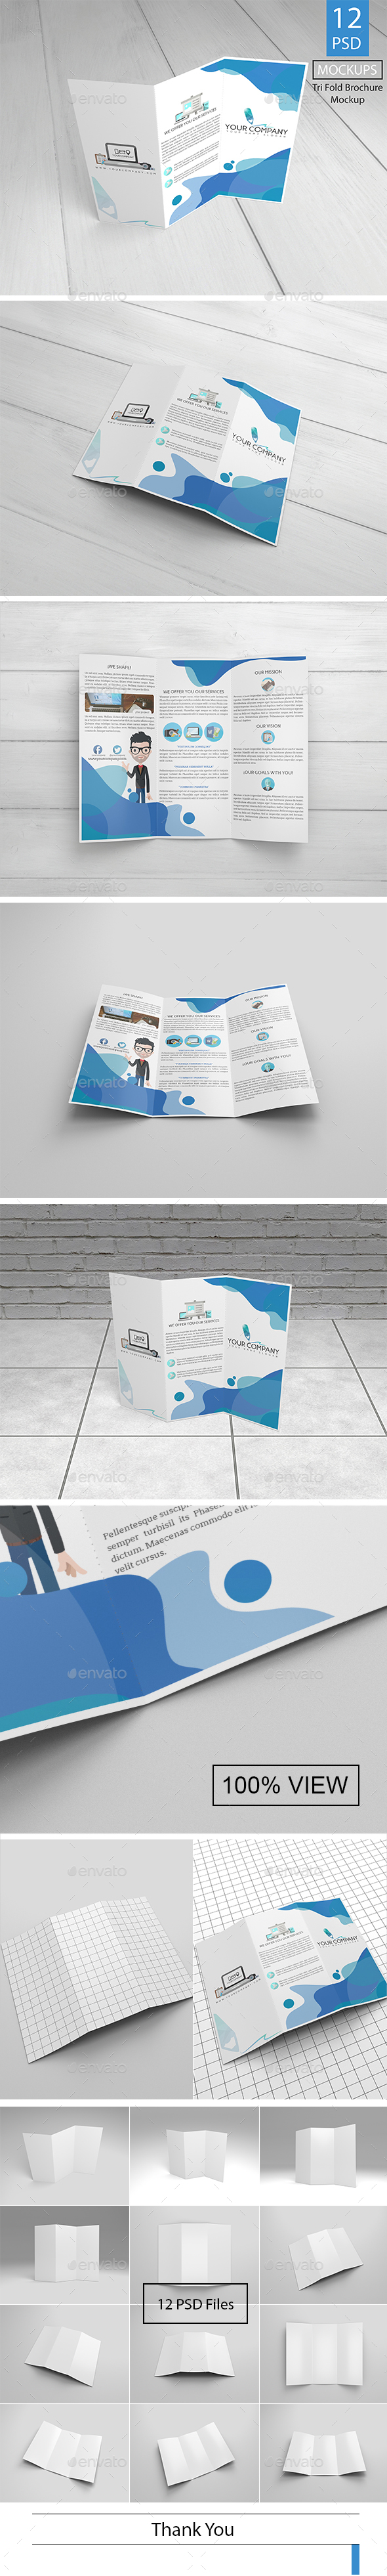 12 Trifold Brochure Mockup - Product Mock-Ups Graphics